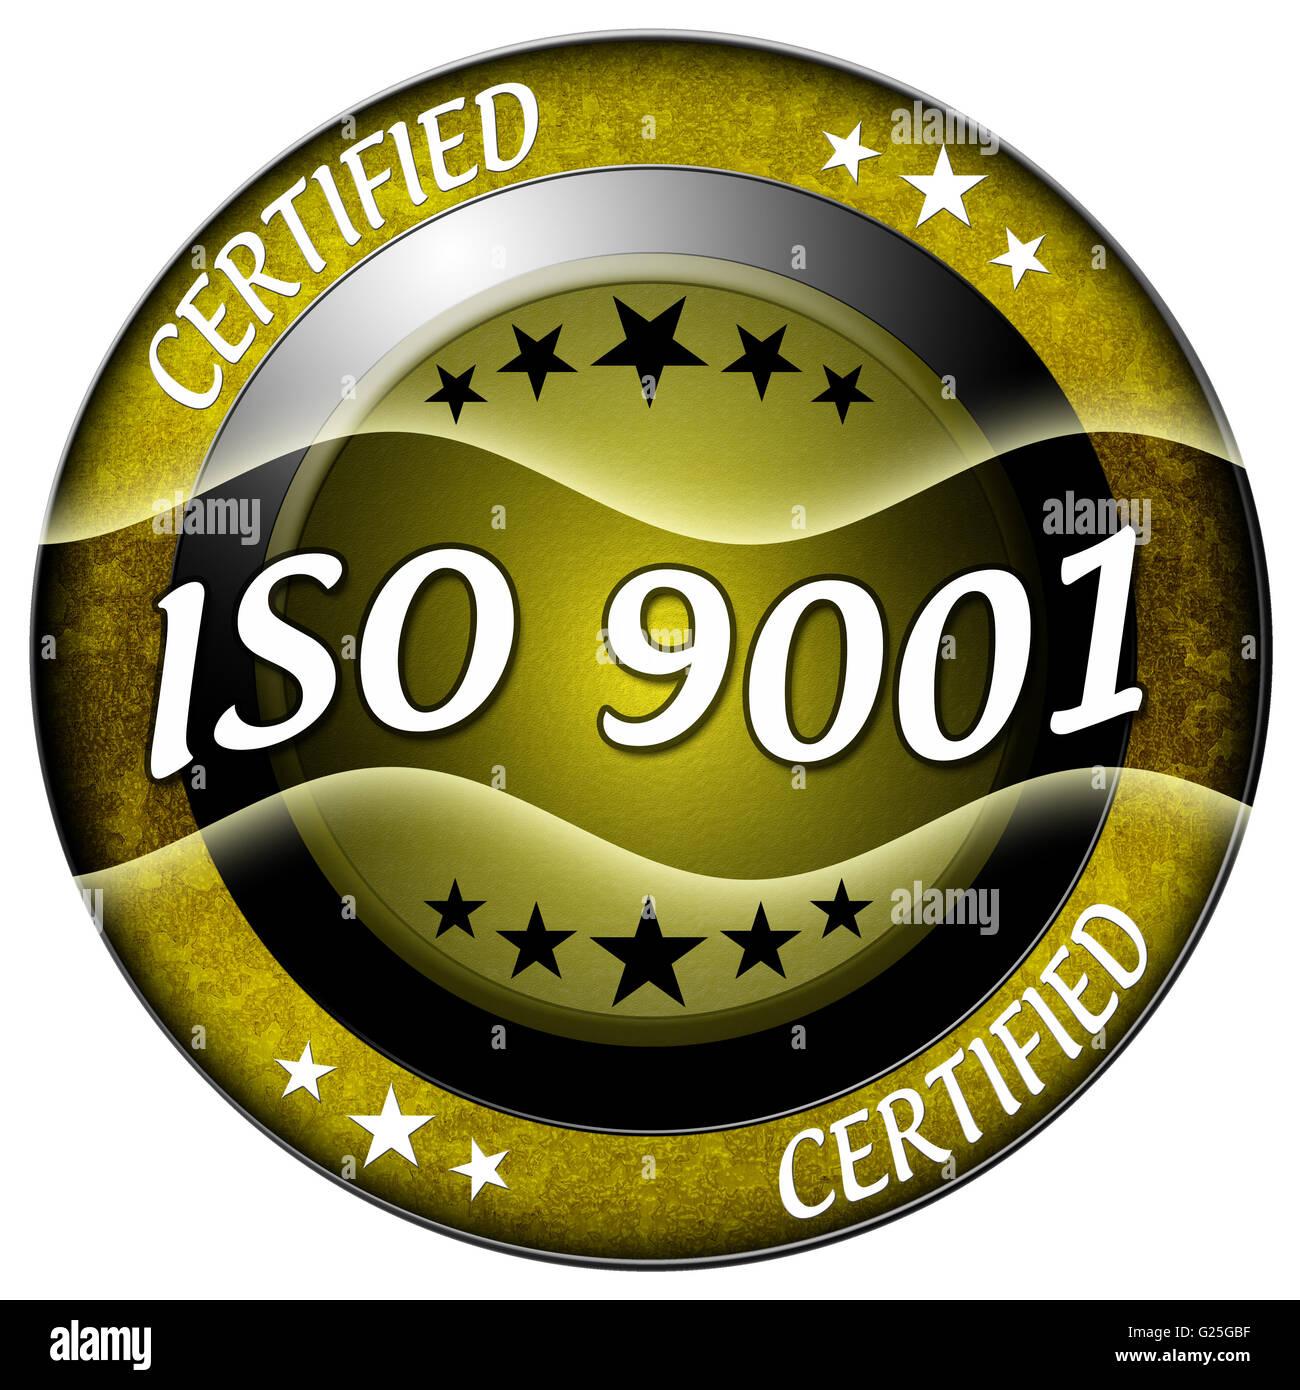 Iso 9001 round gold icon isolated - Stock Image